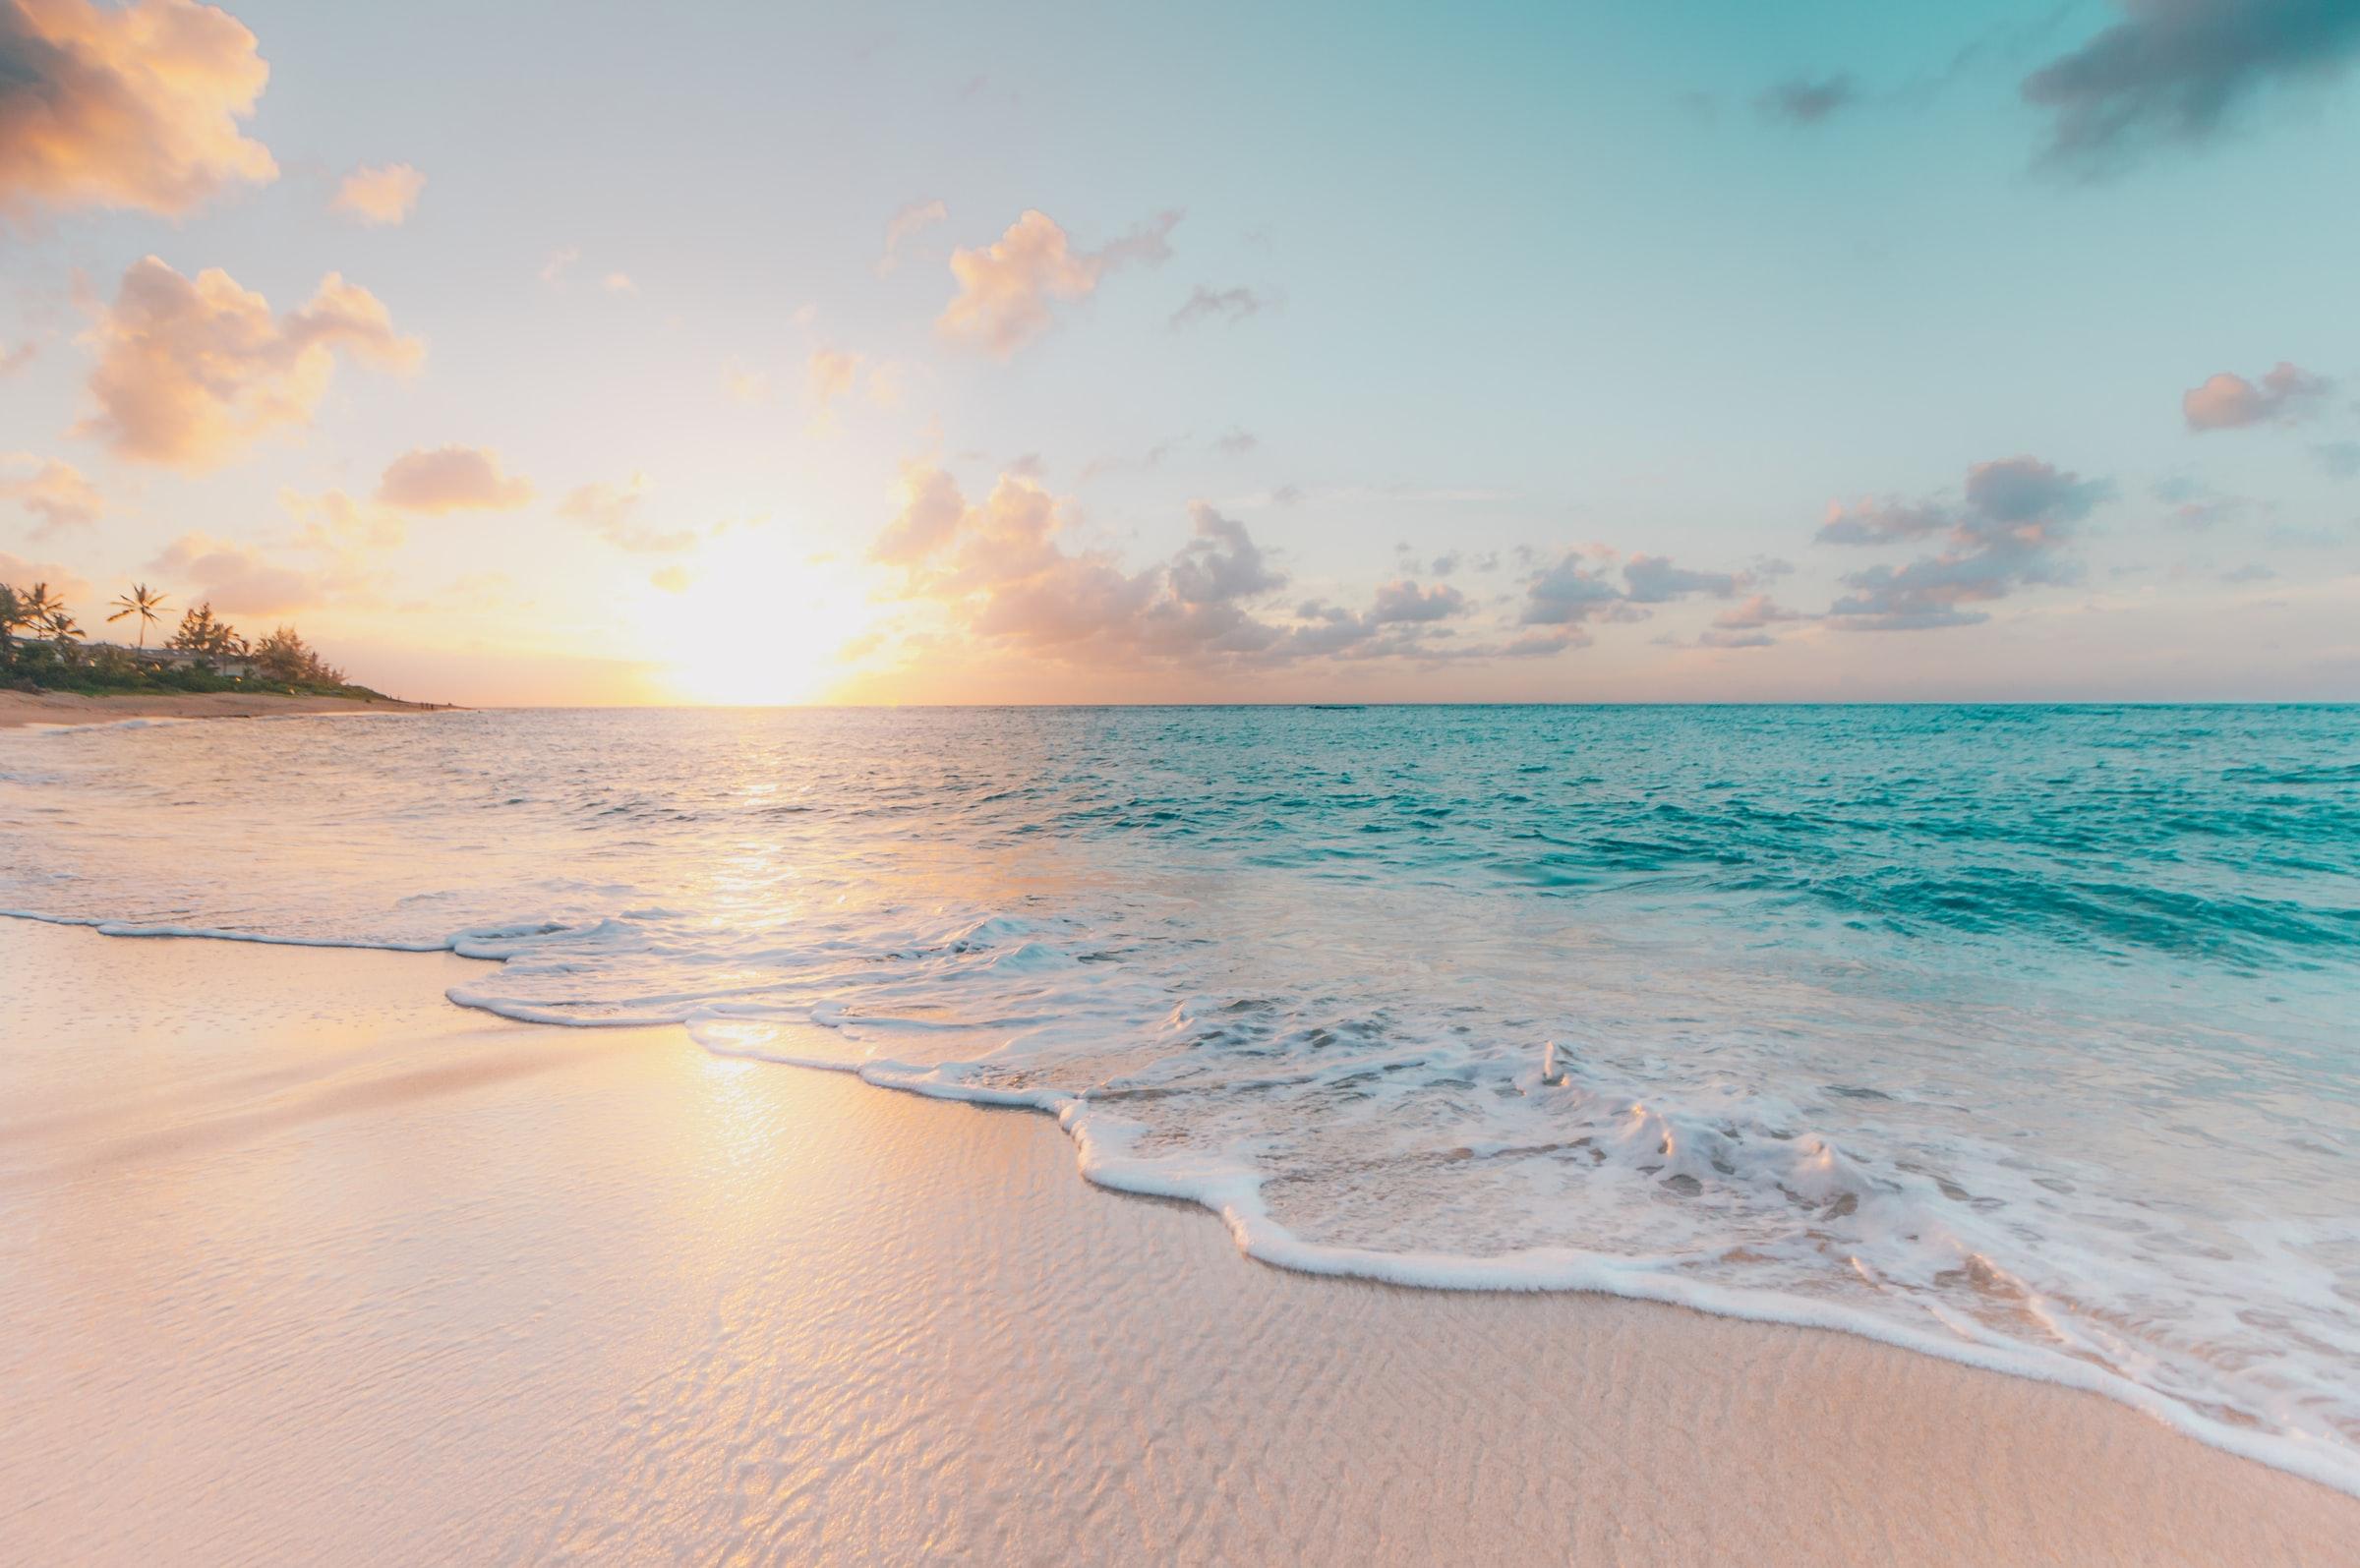 beach online scheduling software success